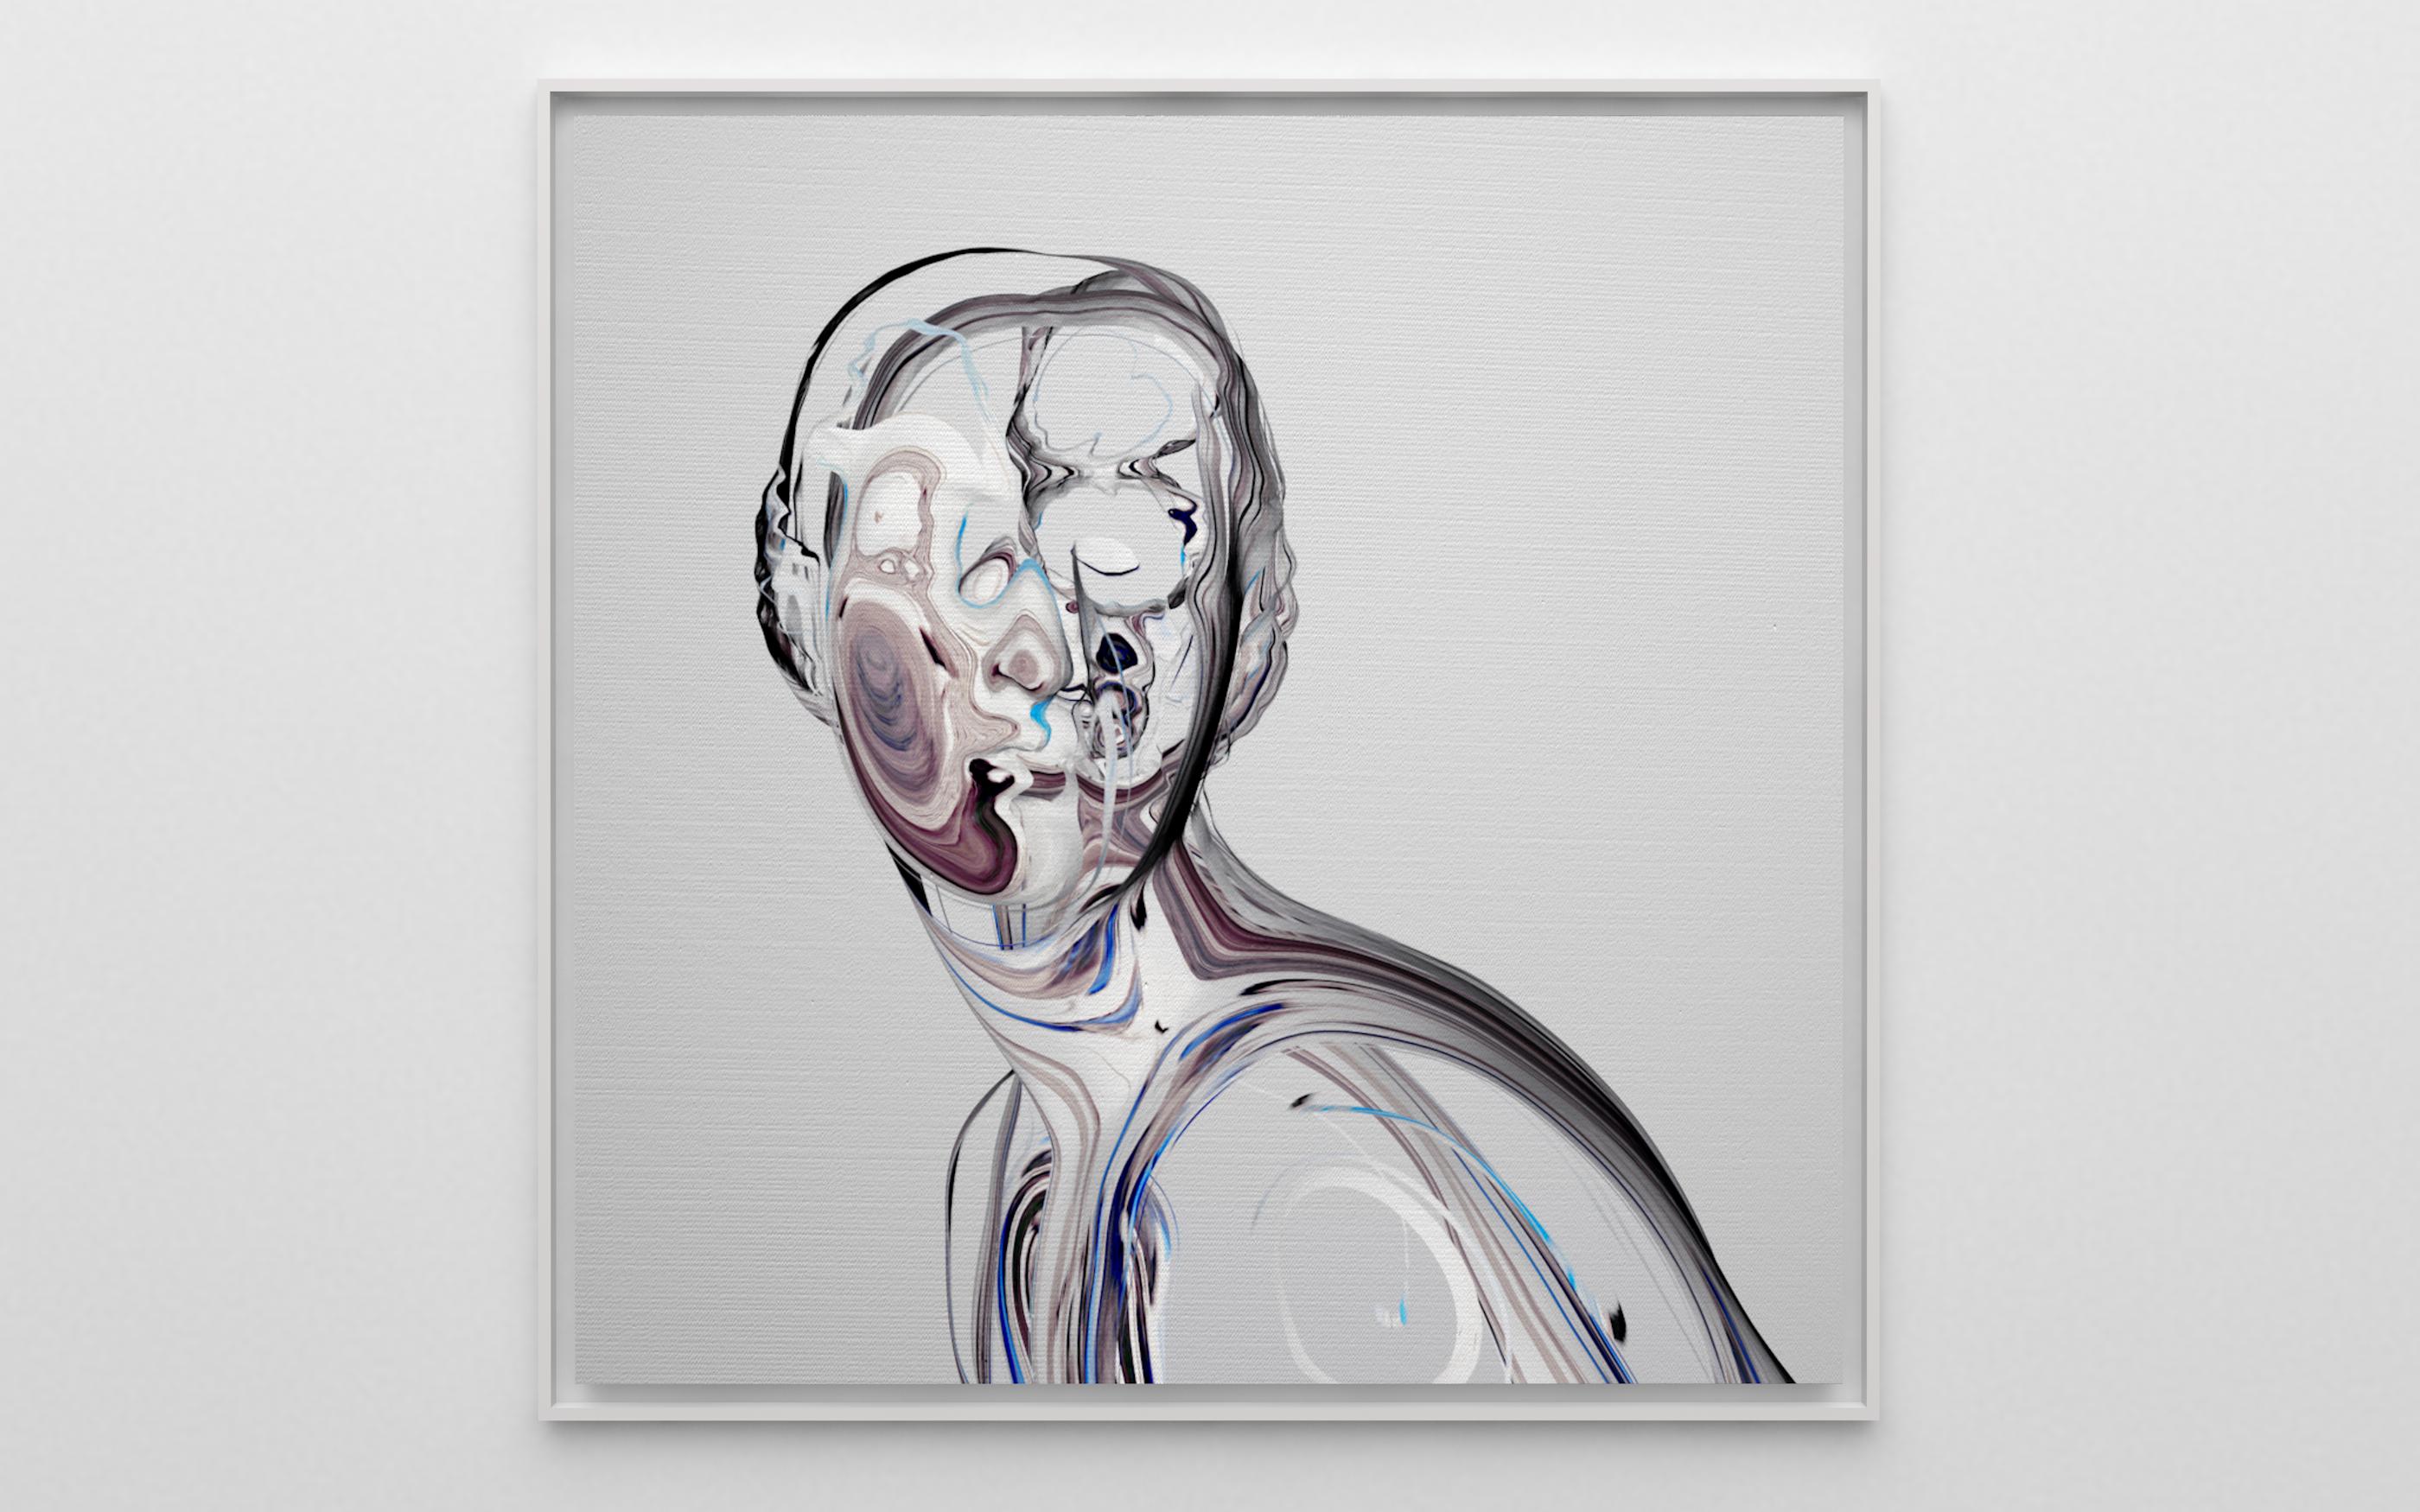 sougwen_catalog_2018-1x1_face5